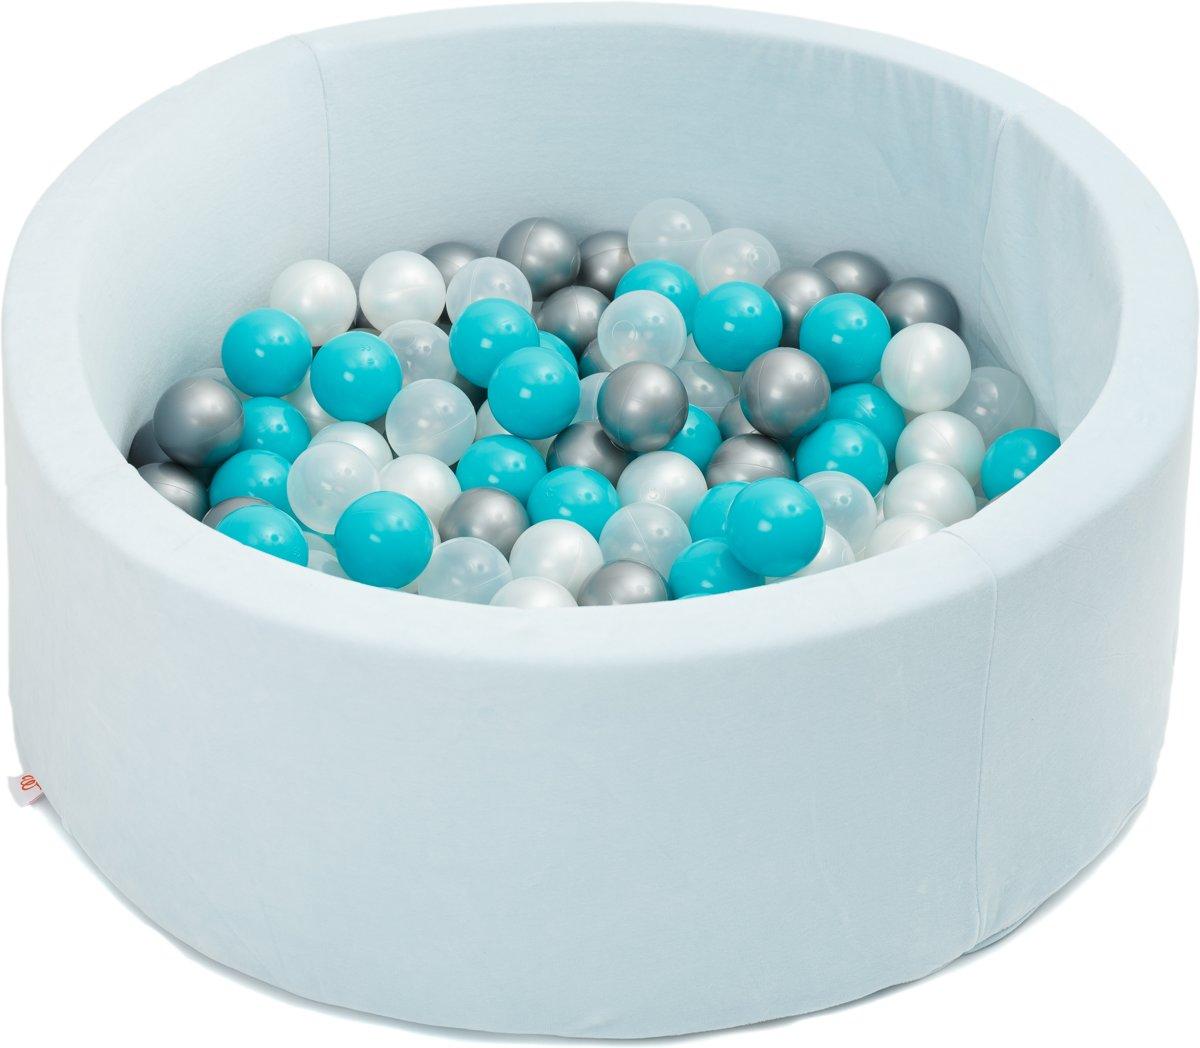 FUJL - Ballenbak - Speelbak - Licht blauw - ⌀ 90 cm - 200 ballen - Kleuren - Zilver - Parel  -Turquoise - Transparant